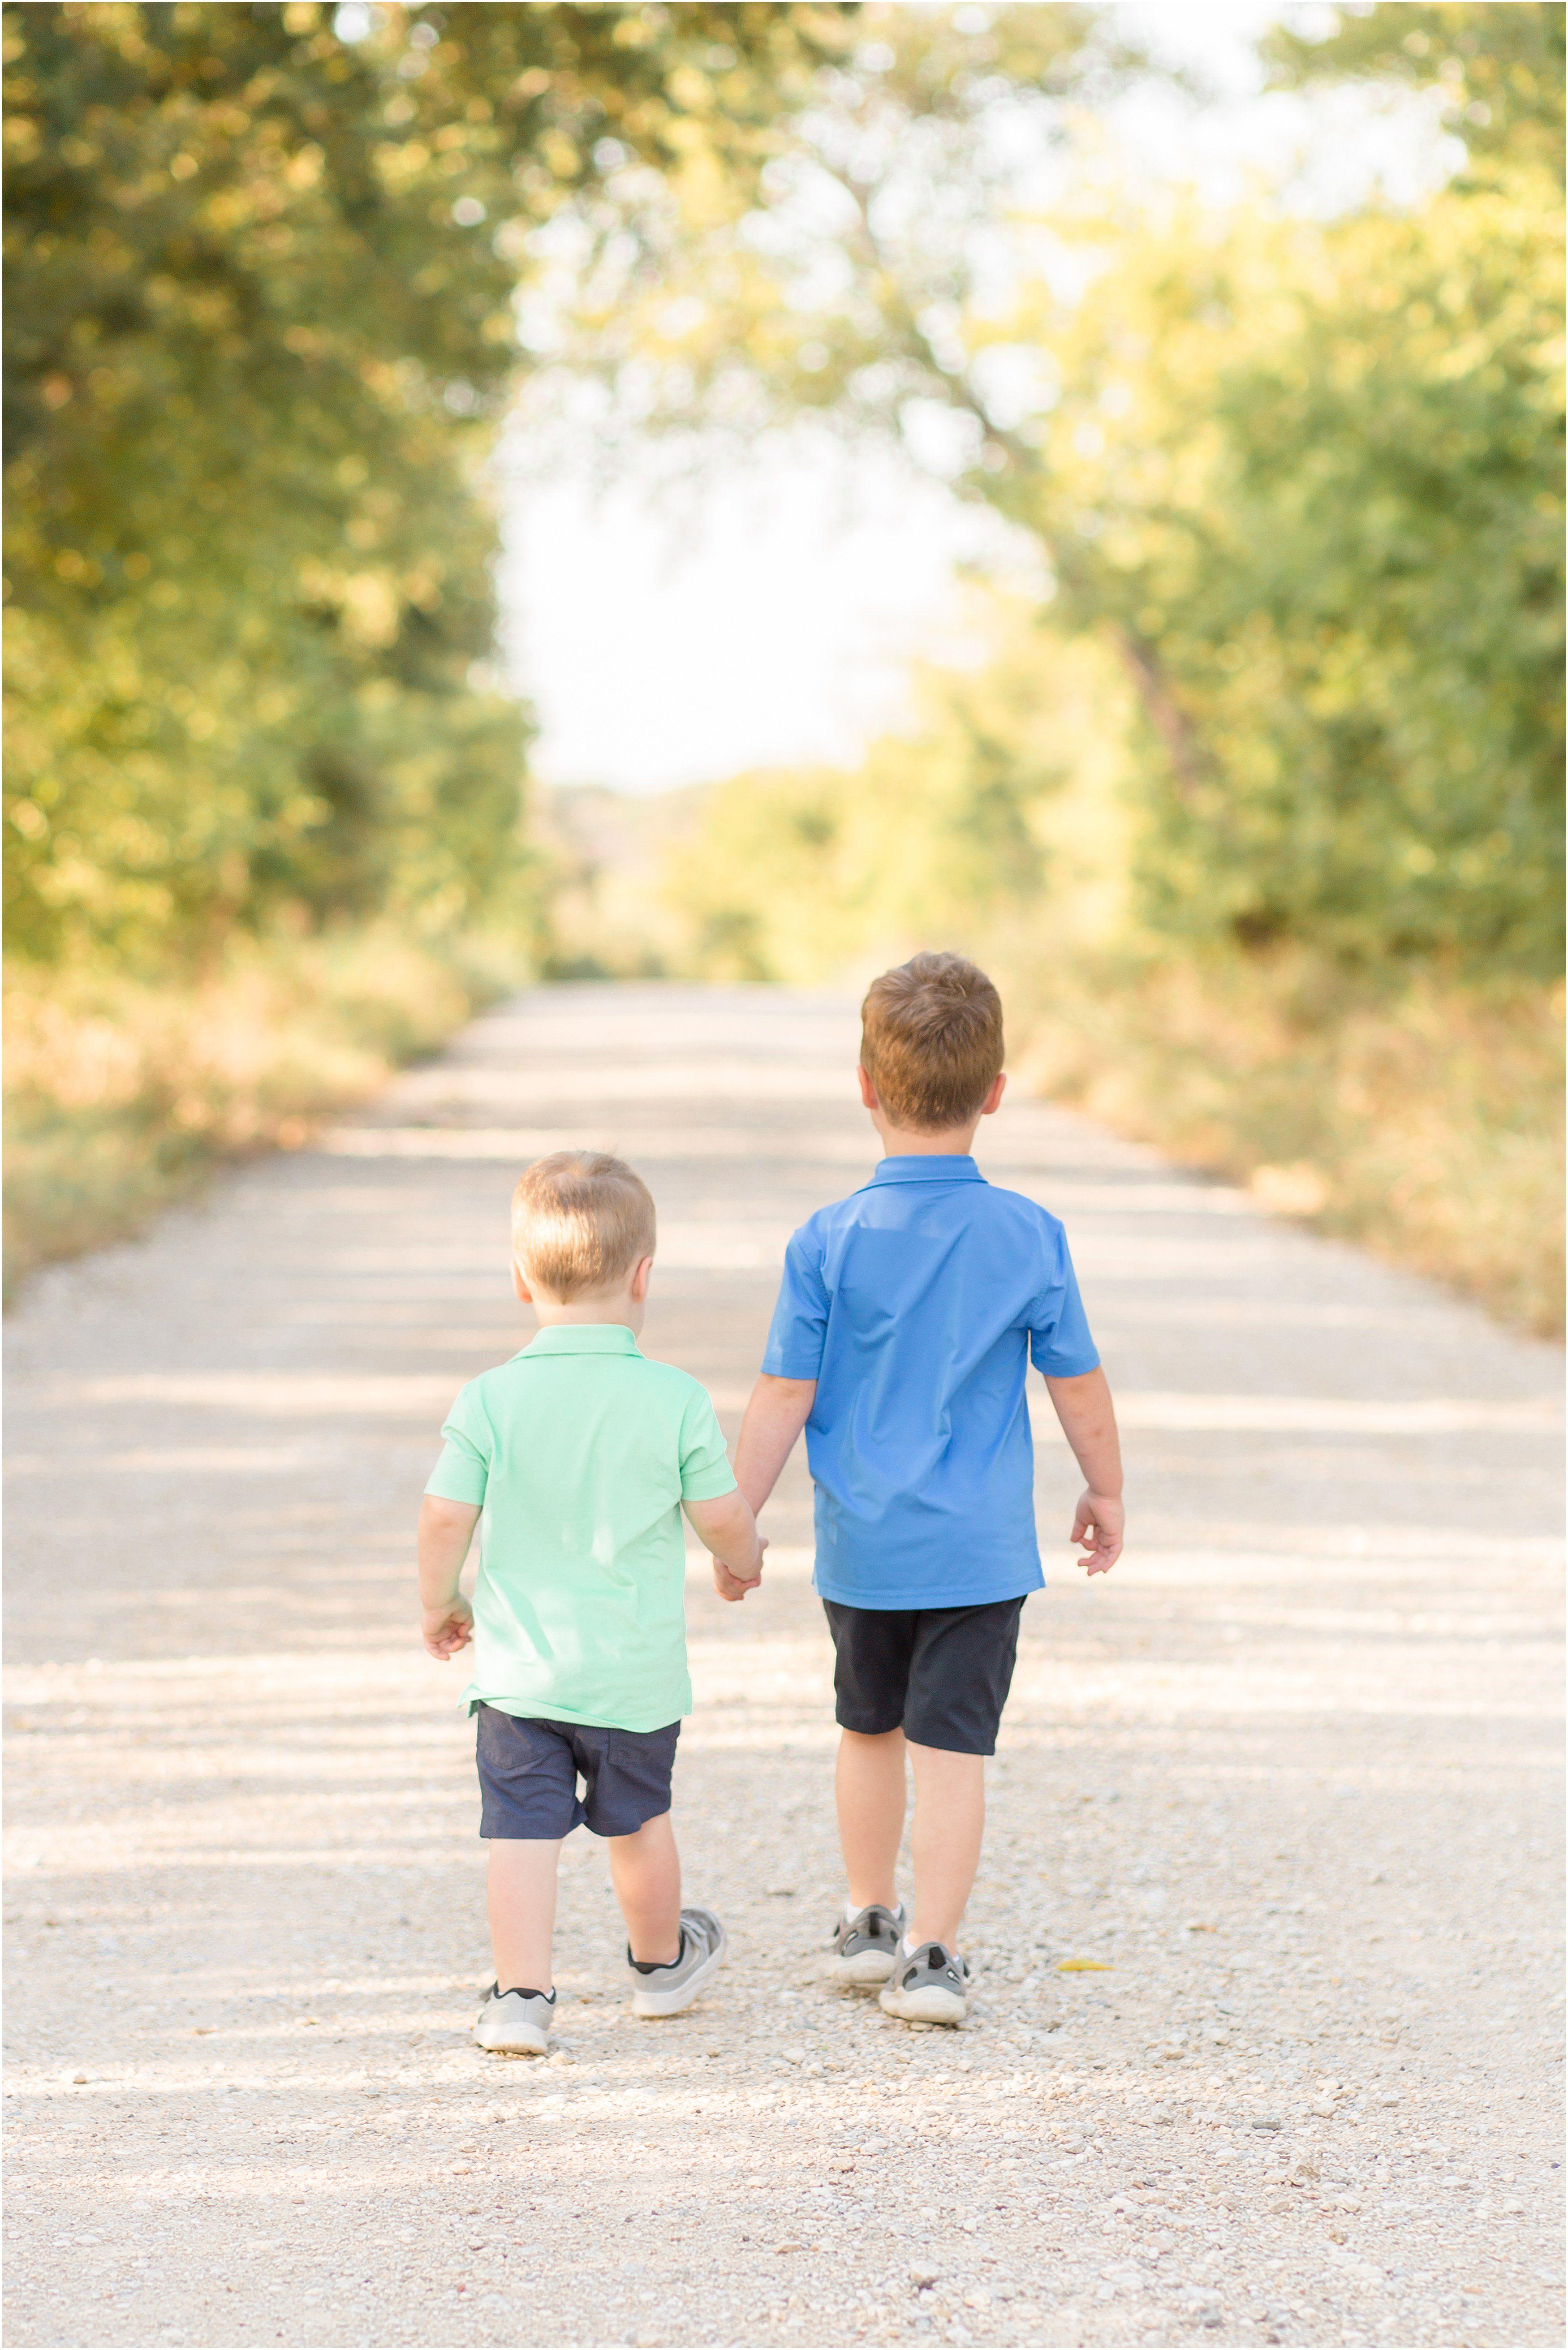 Aubrey Dirt Road Fall Family Minis #familyphotooutfits